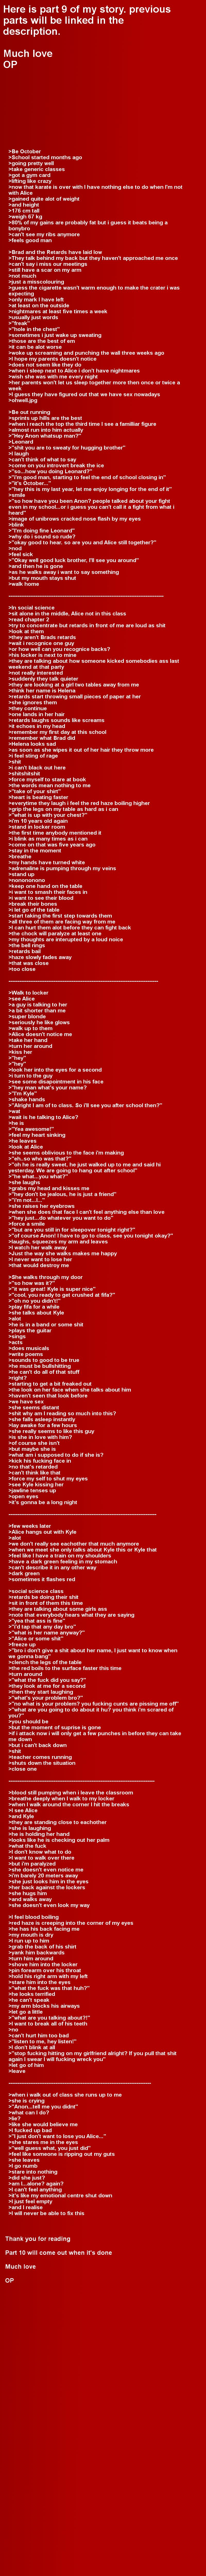 Tale of a lost boy-Part 9. part 1 www.funnyjunk.com/channel/feels/Tale+of+a+lost+boy-part+1/fpktGsc/ part 2 www.funnyjunk.com/channel/feels/Tale+of+a+lost+boy-+